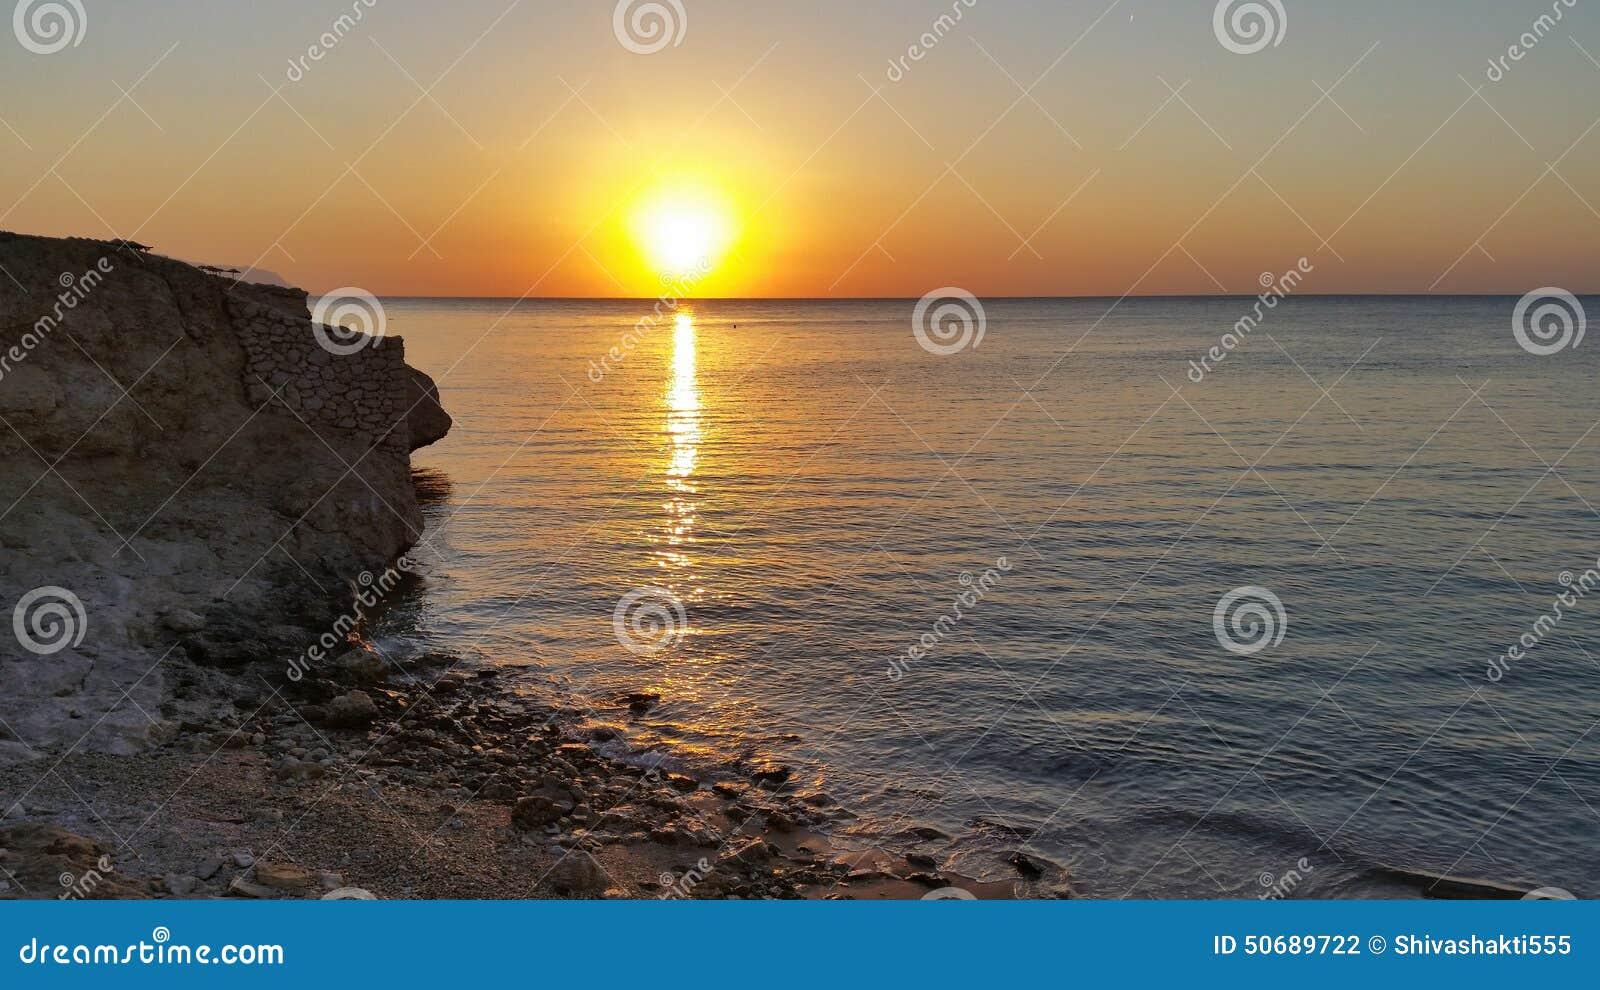 Download 埃及沙姆・谢赫 库存照片. 图片 包括有 beautifuler, 天空, 目的地, 本质, 气候, beauvoir - 50689722